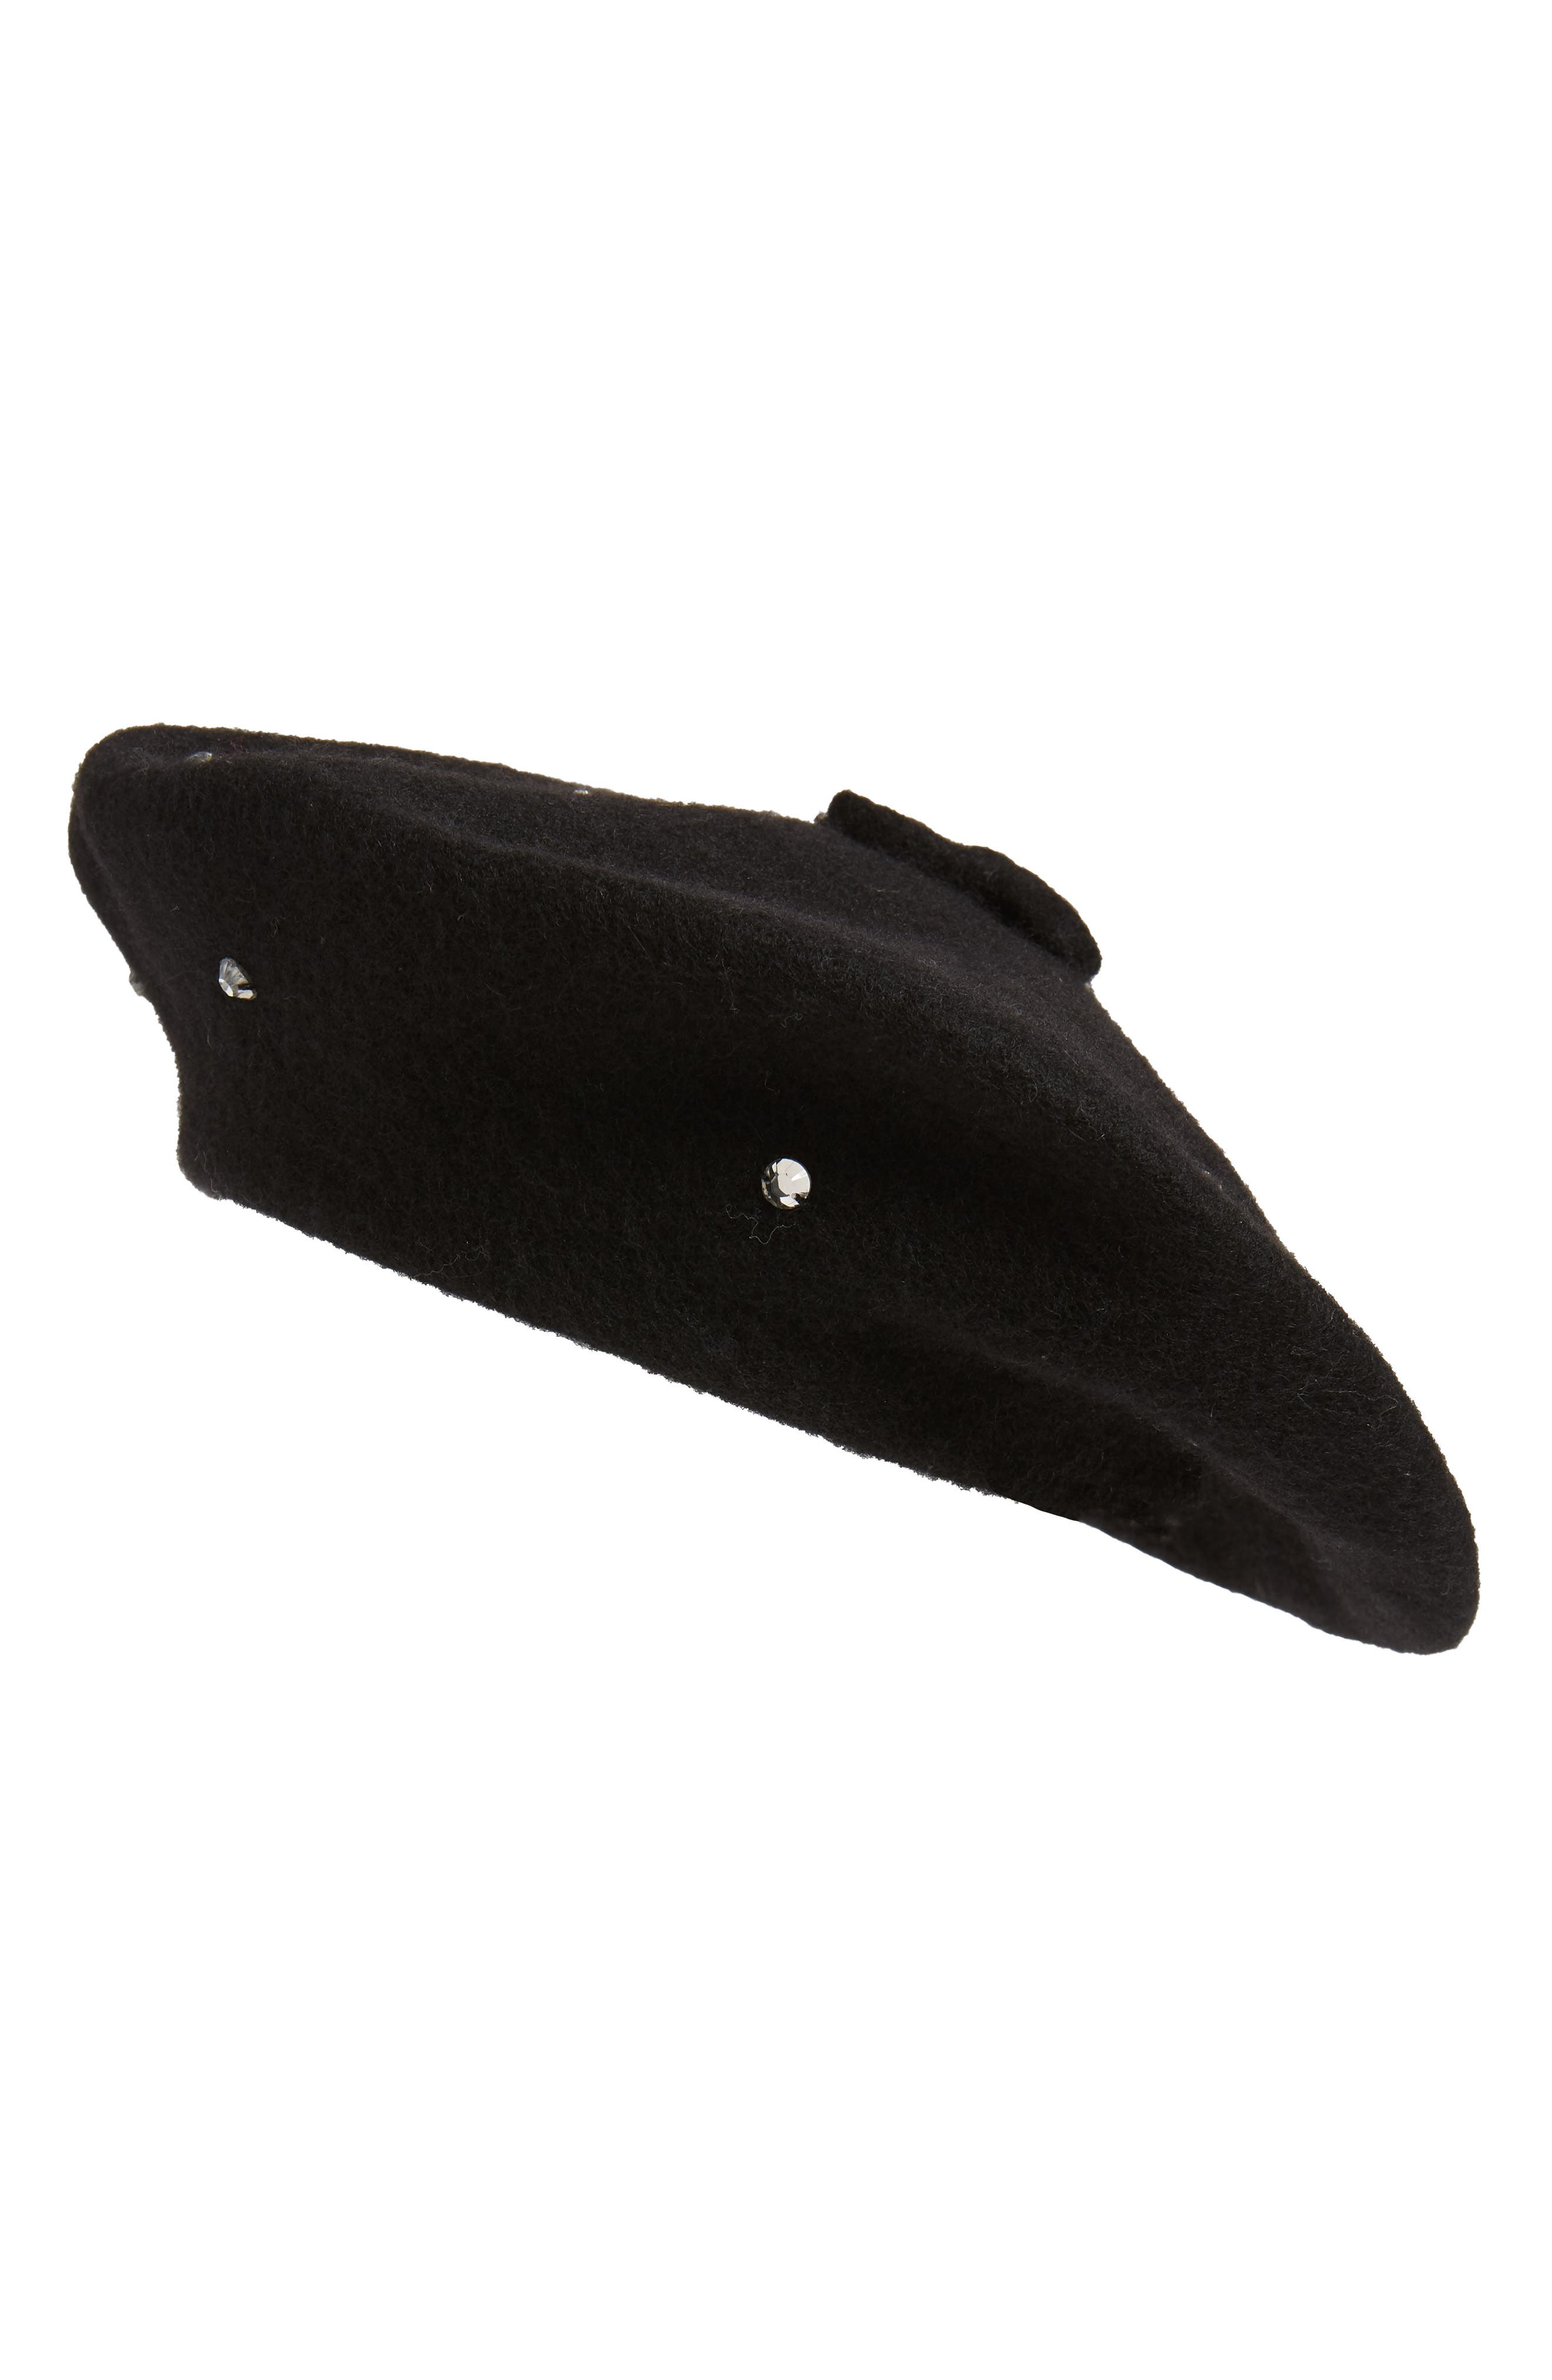 KATE SPADE NEW YORK bedazzled felt beret, Main, color, BLACK/ SMOKE